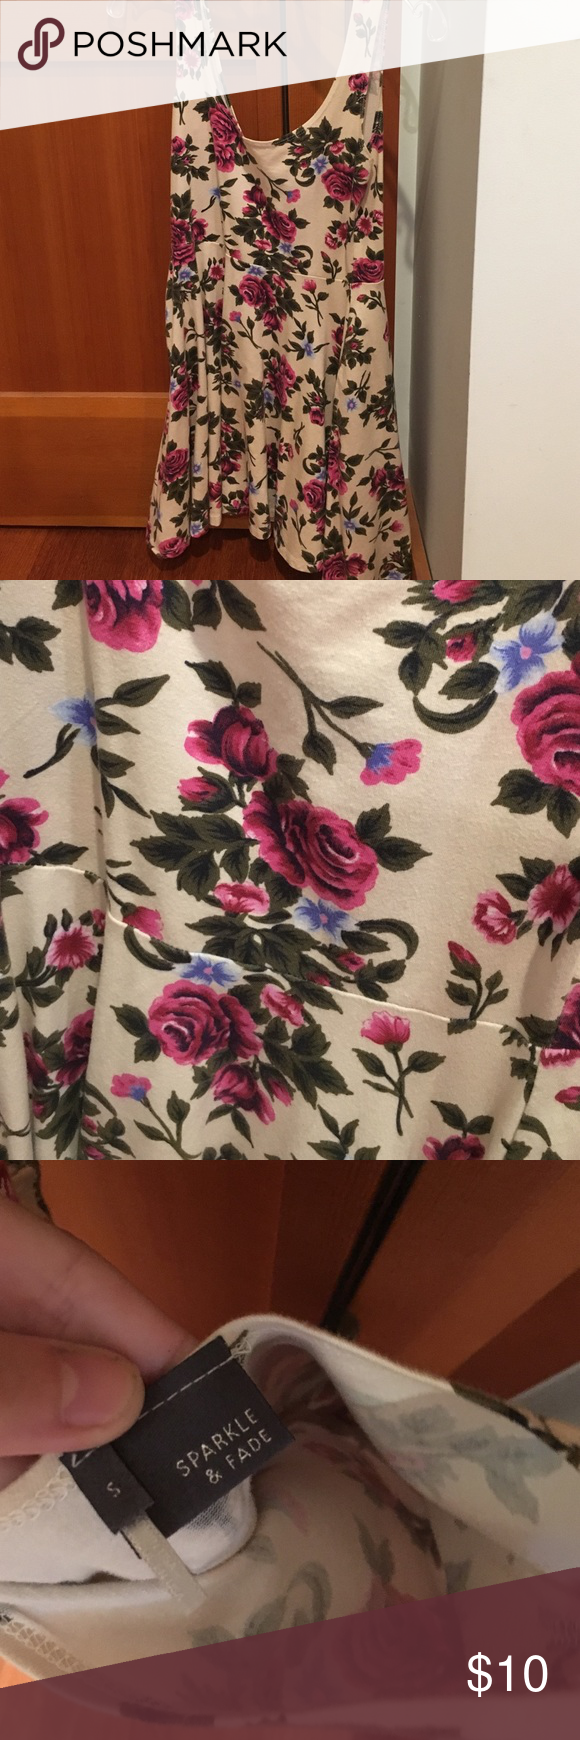 Urban outfitters dress! Like new floral urban outfitters dress! only worn twice! size small Urban Outfitters Dresses Mini